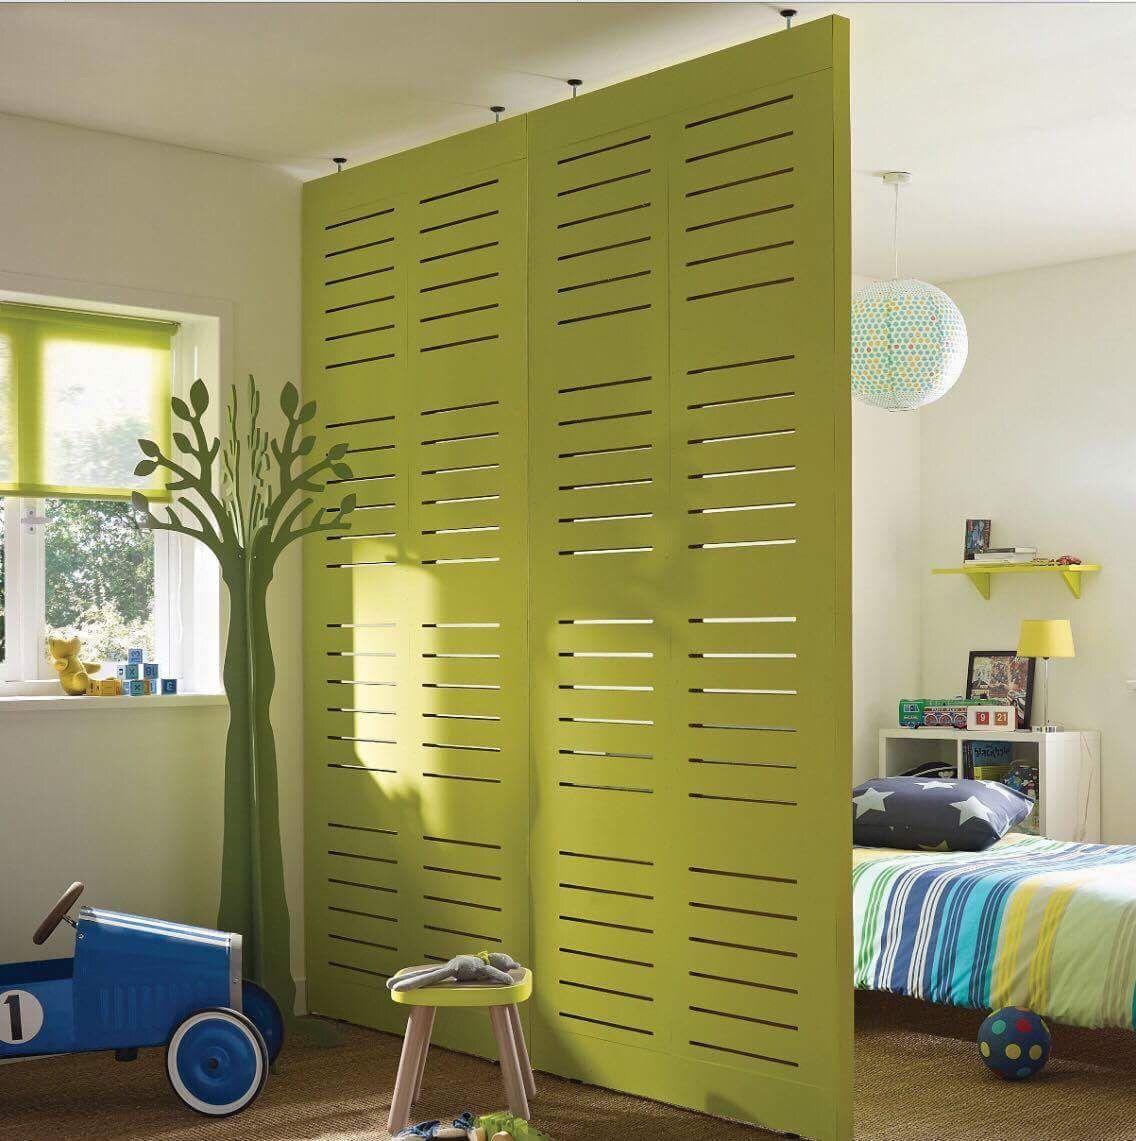 Karalis Room Divider - Paint Any Colour   Home   Pinterest   Divider ...